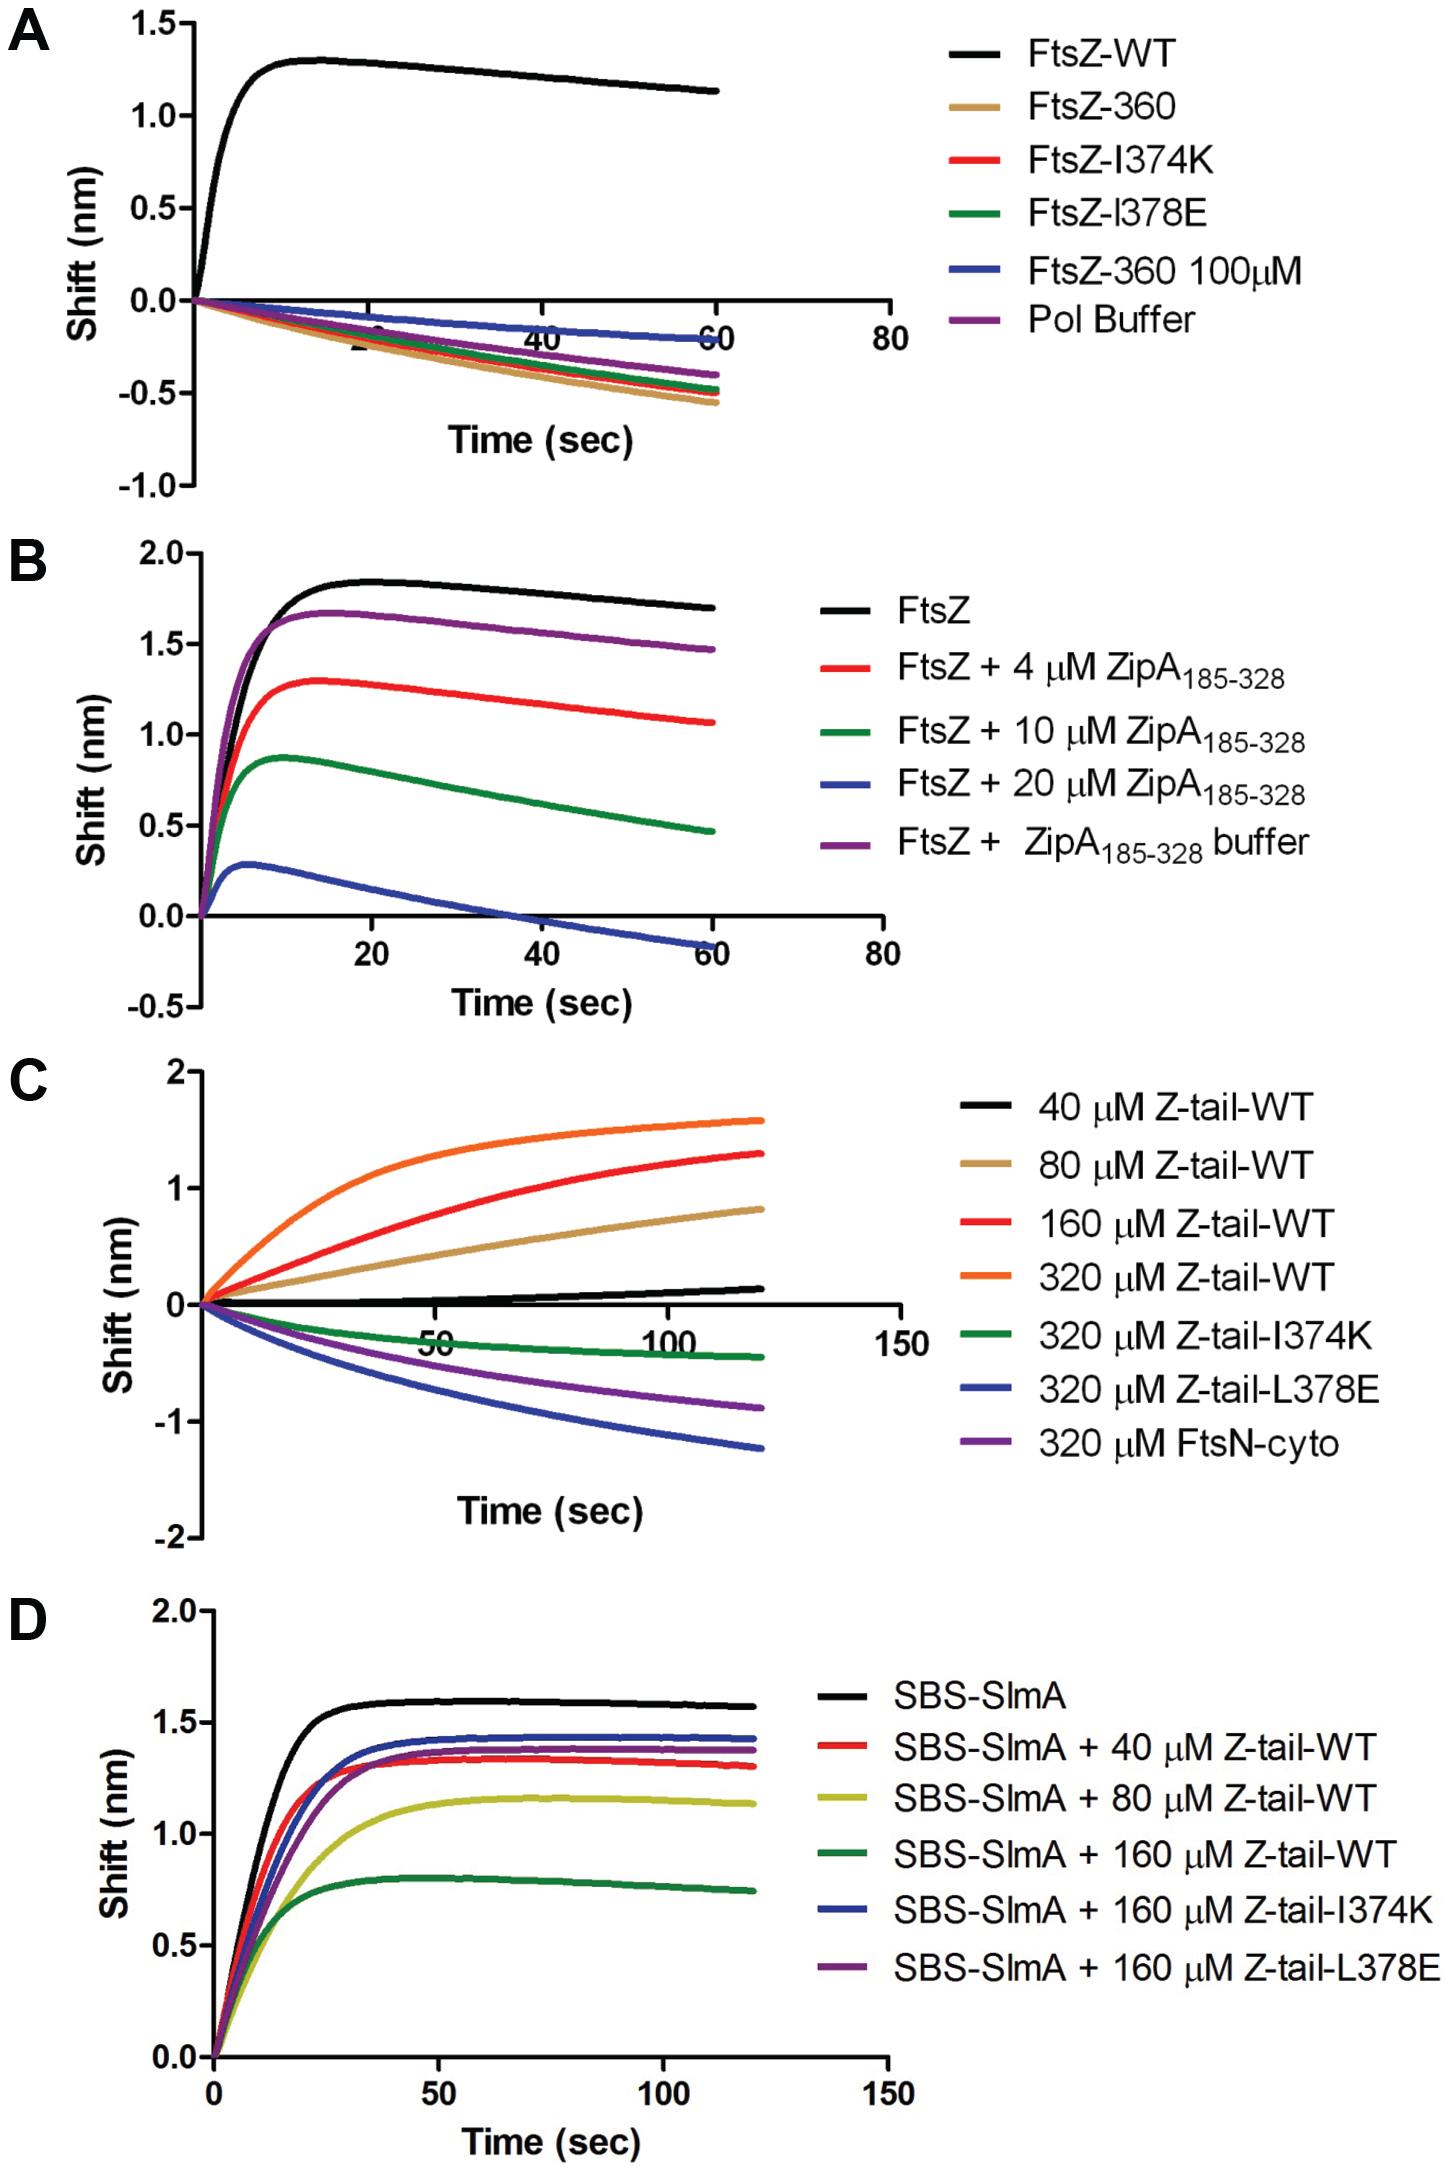 Further analysis of FtsZ-SlmA binding using biolayer interferometry.